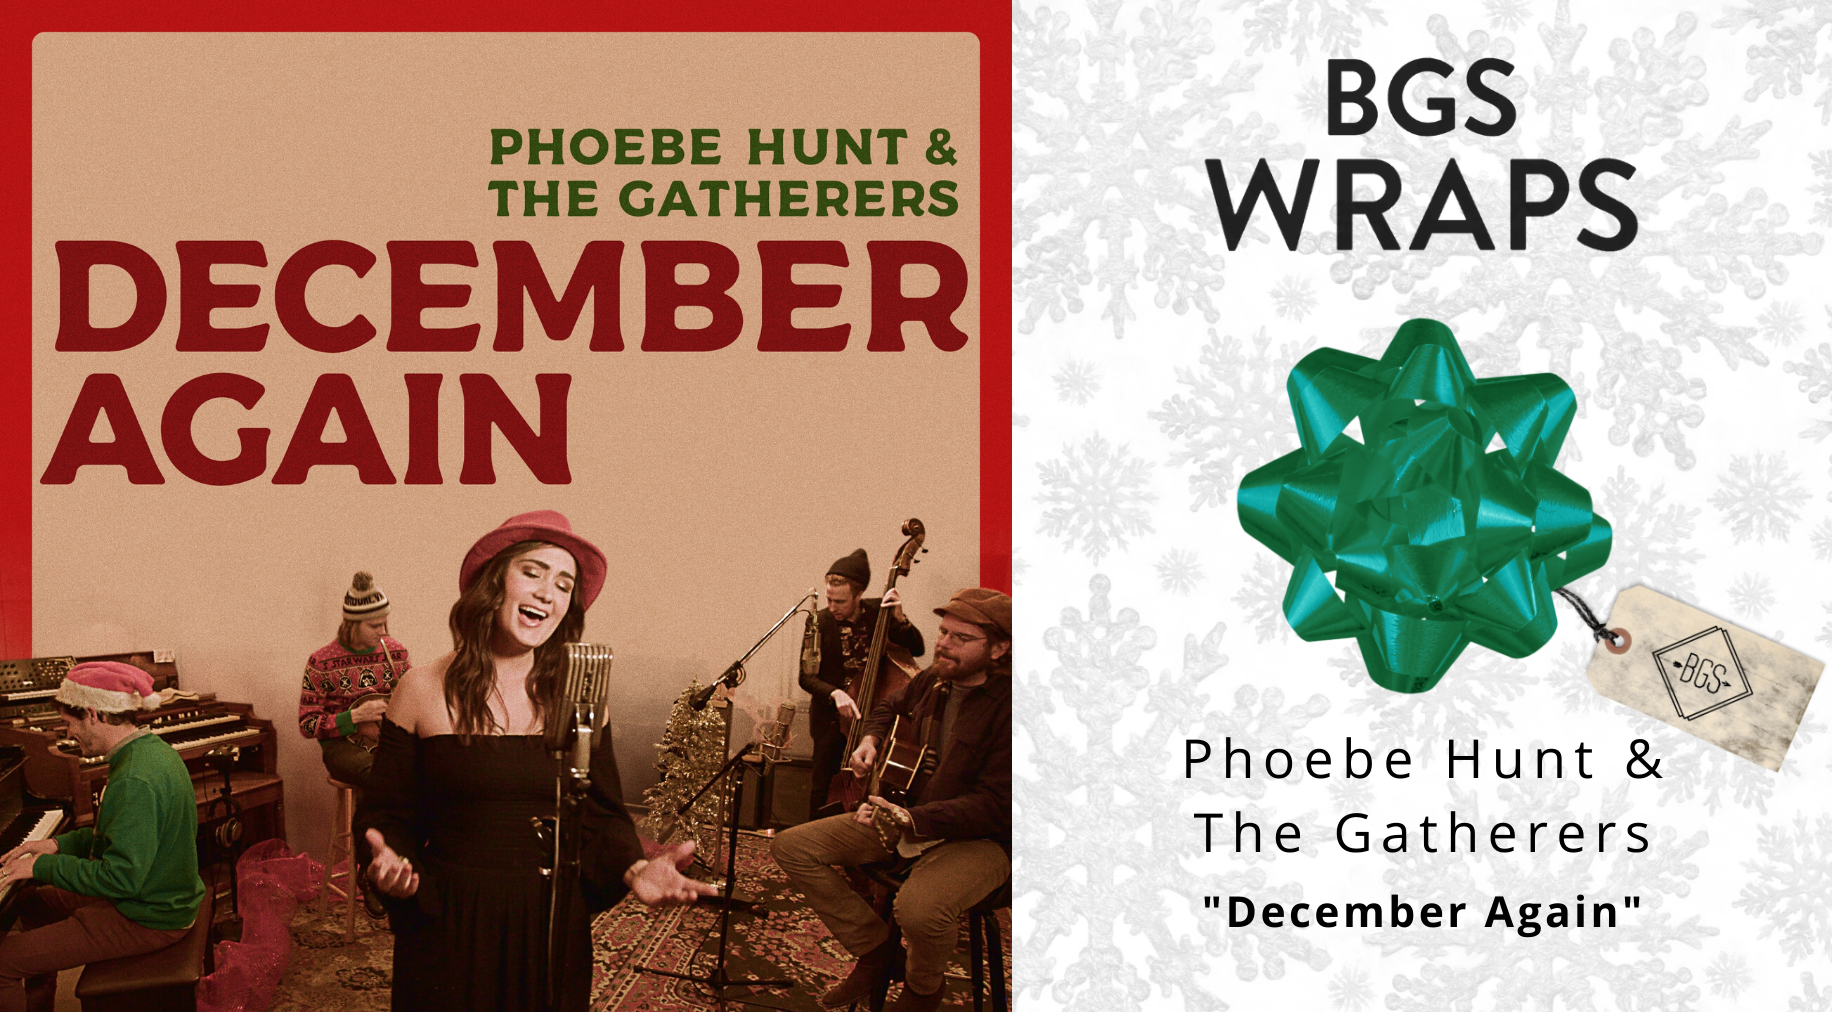 BGS WRAPS: Phoebe Hunt & The Gatherers,